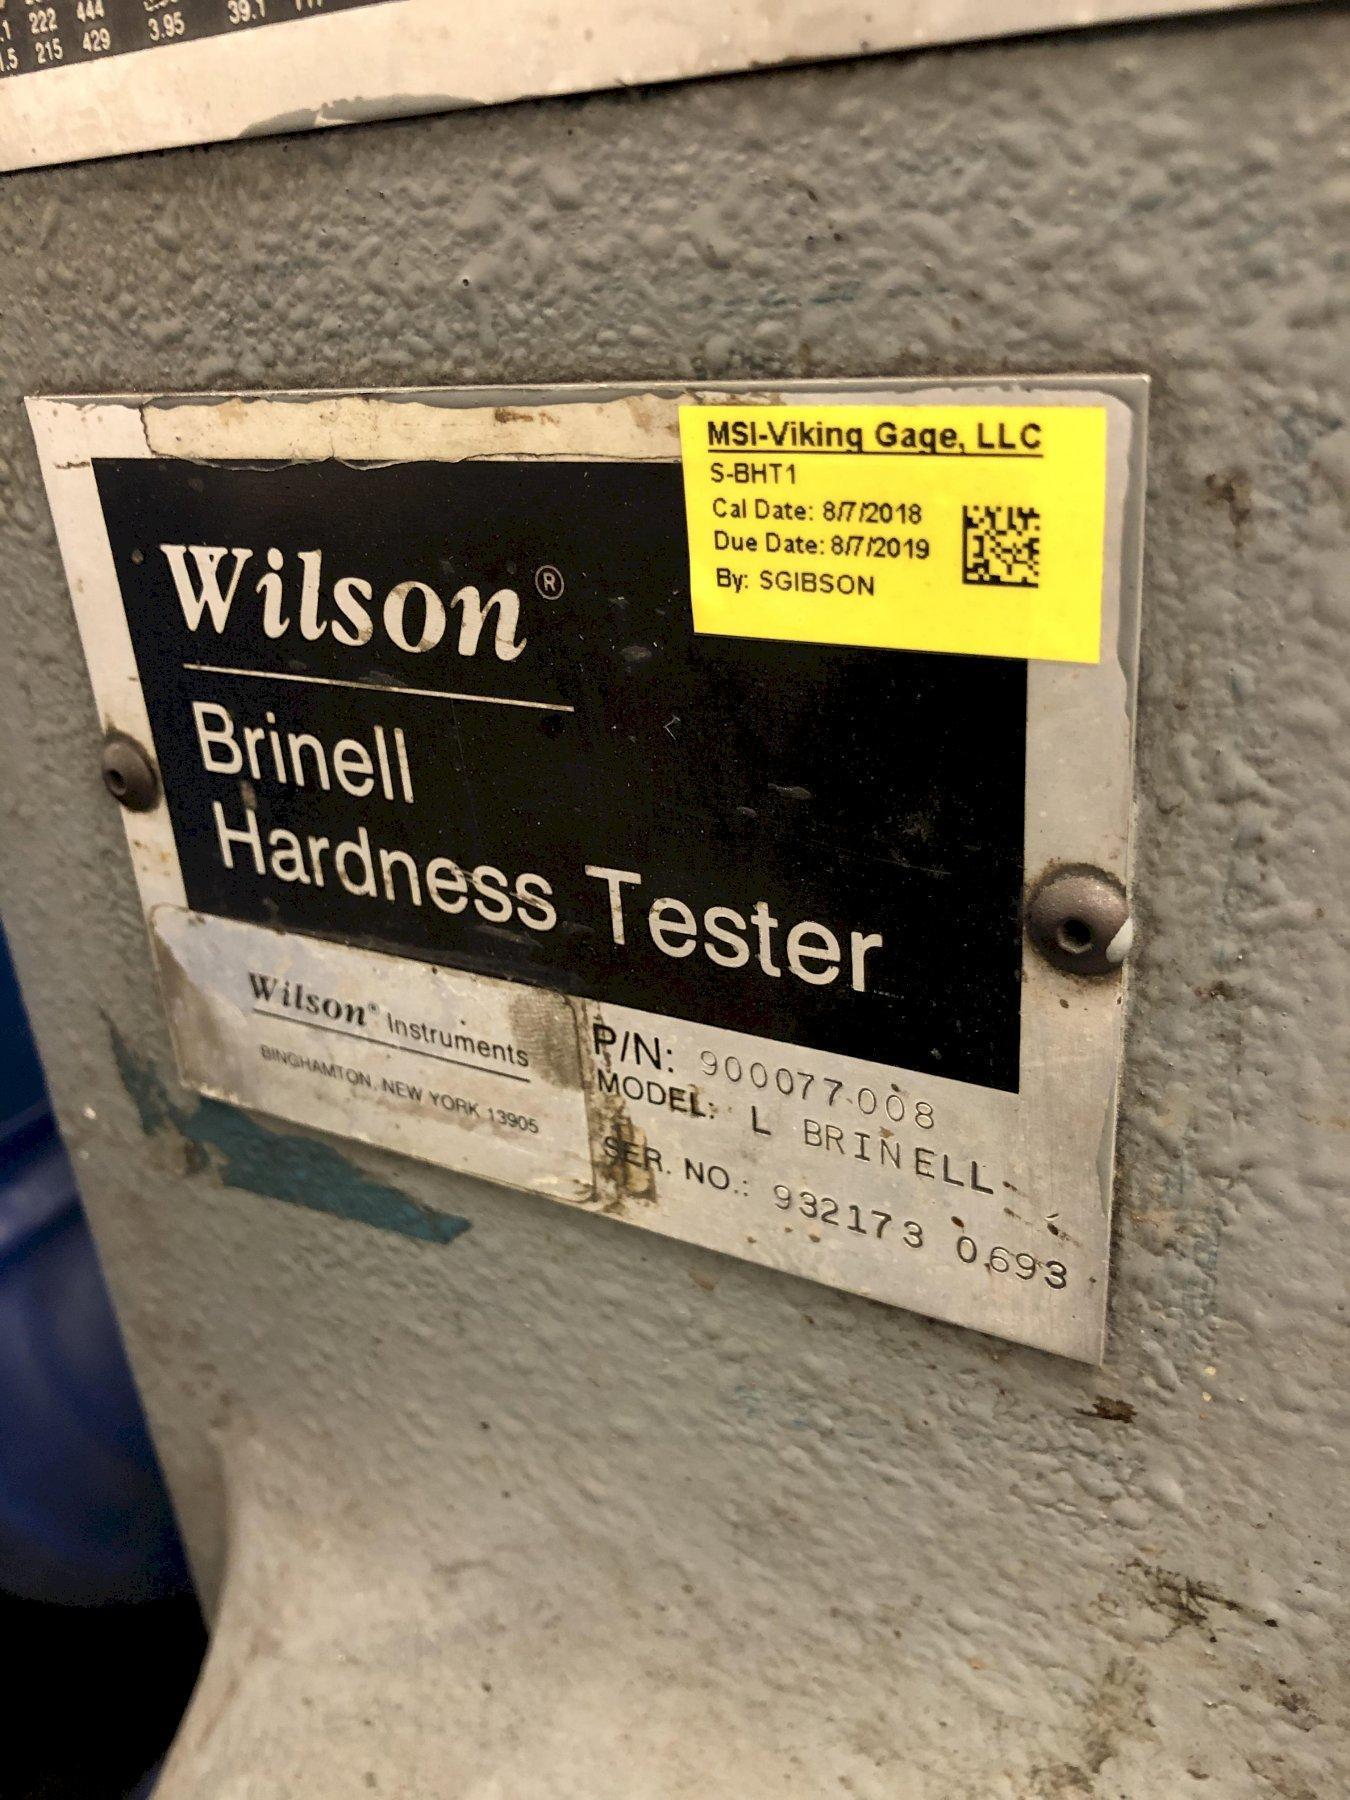 WILSON MODEL L BRINELL TESTER S/N 932173-0693, 5000 KG